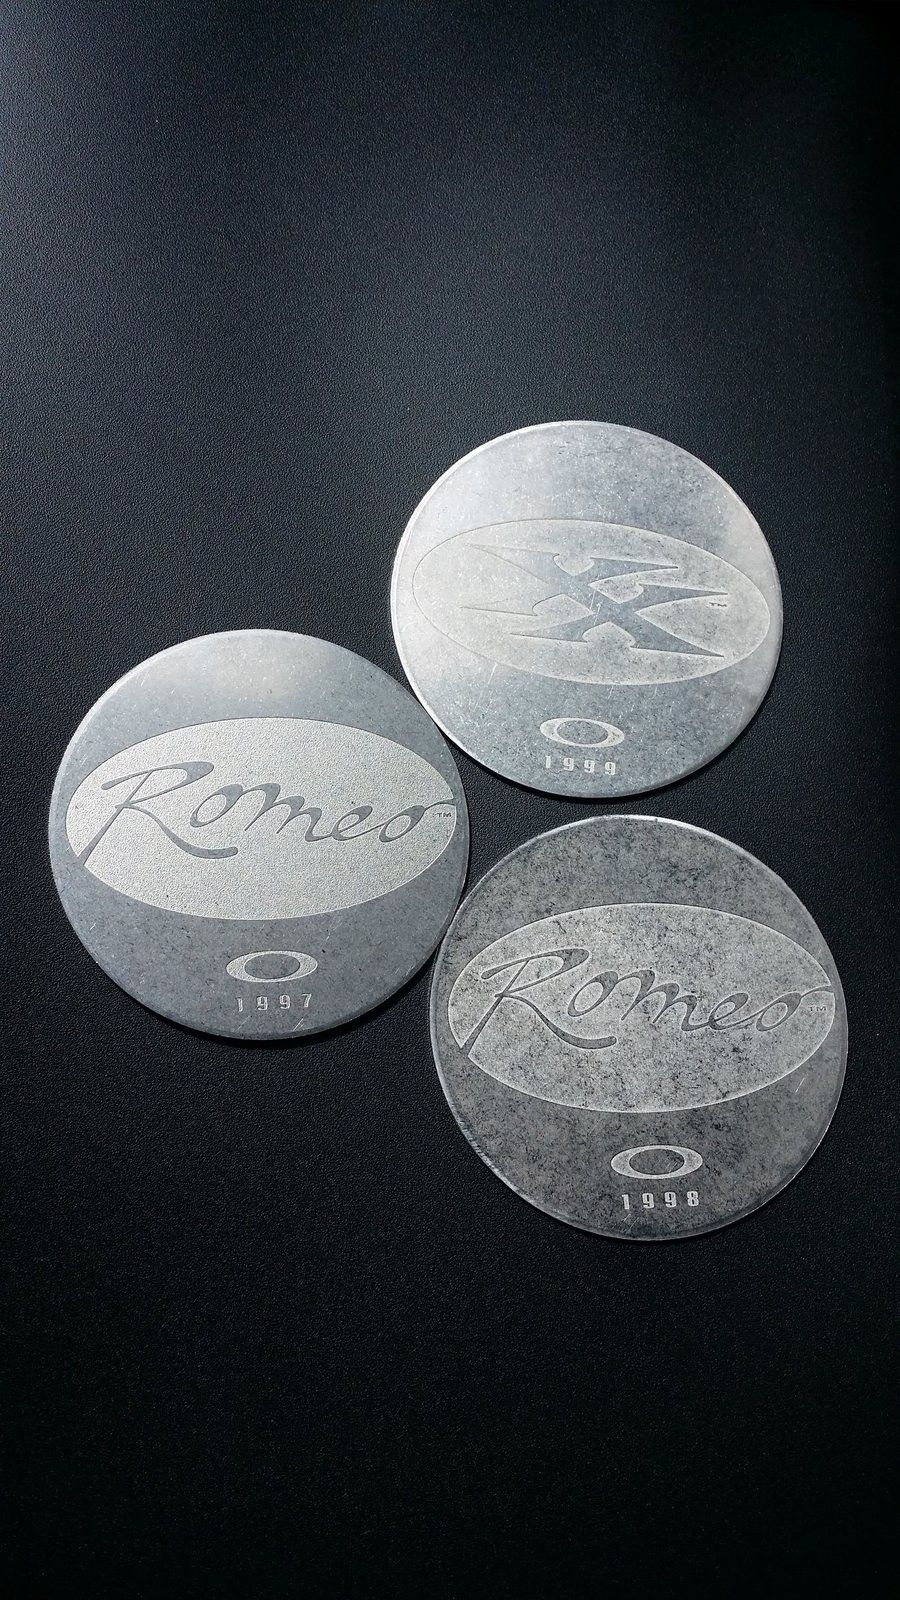 3 X Metal Coins - 20150910_121136.jpg